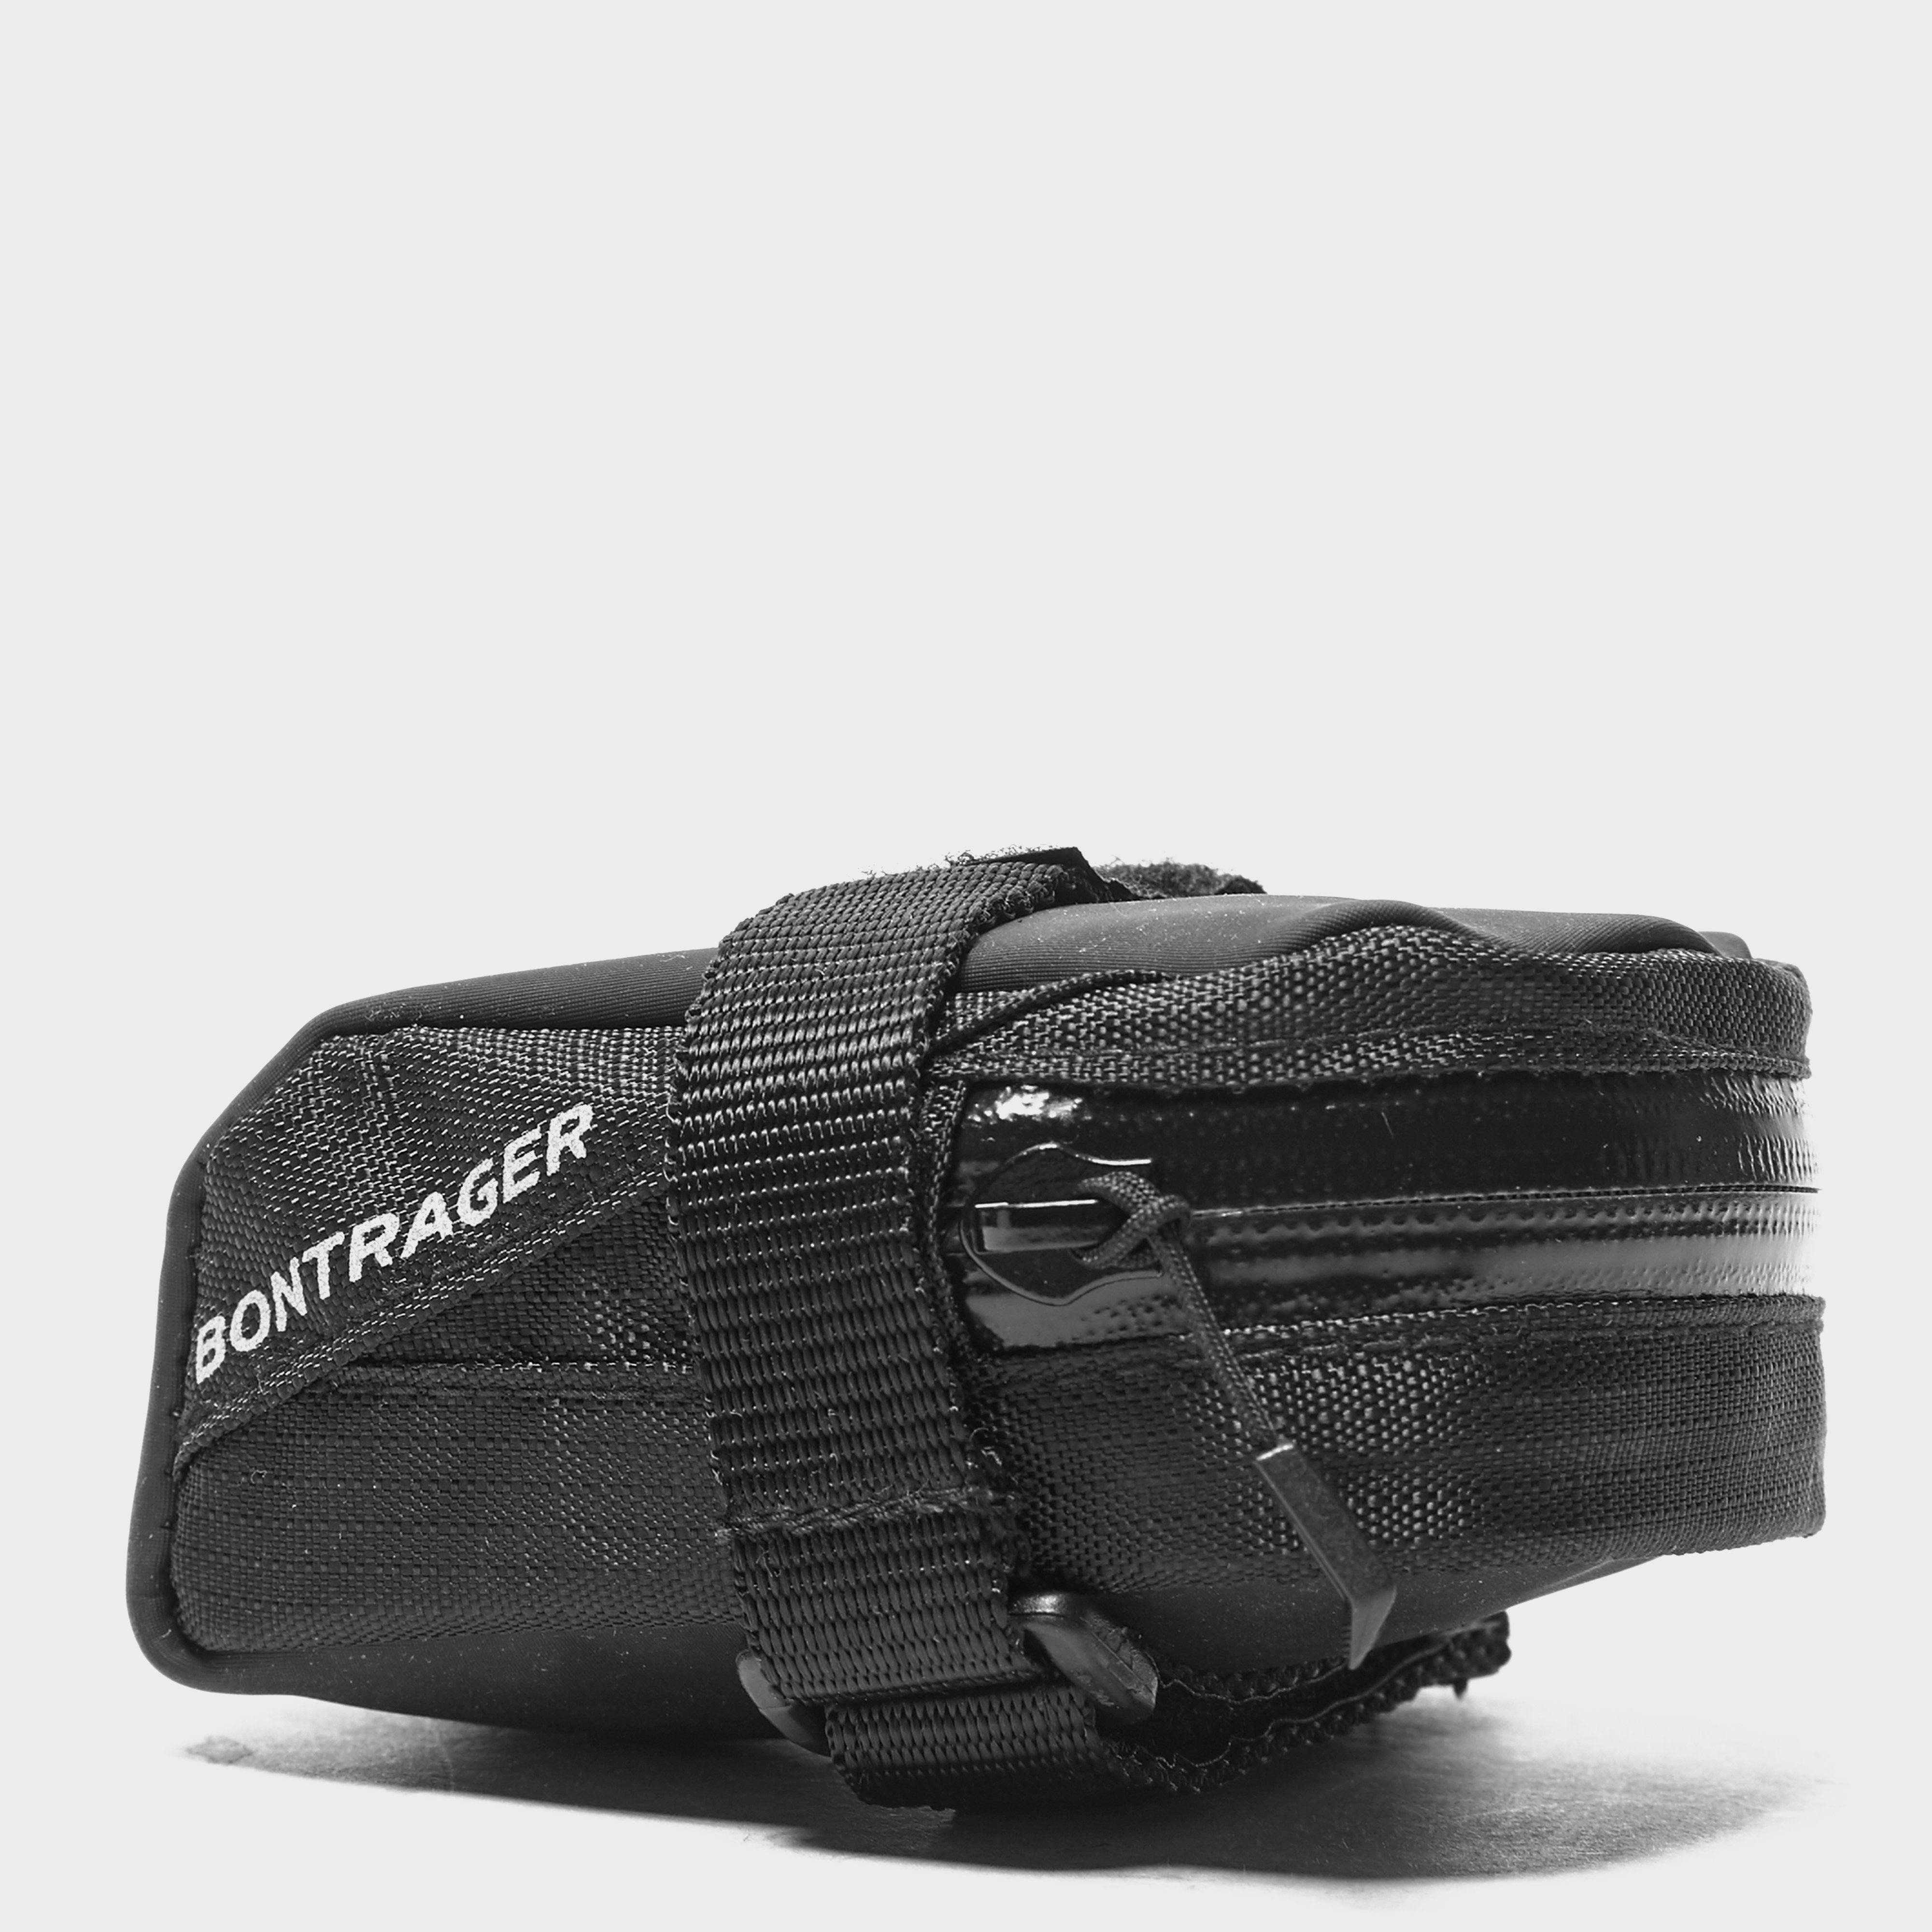 BONTRAGER Elite Seat Pack Micro